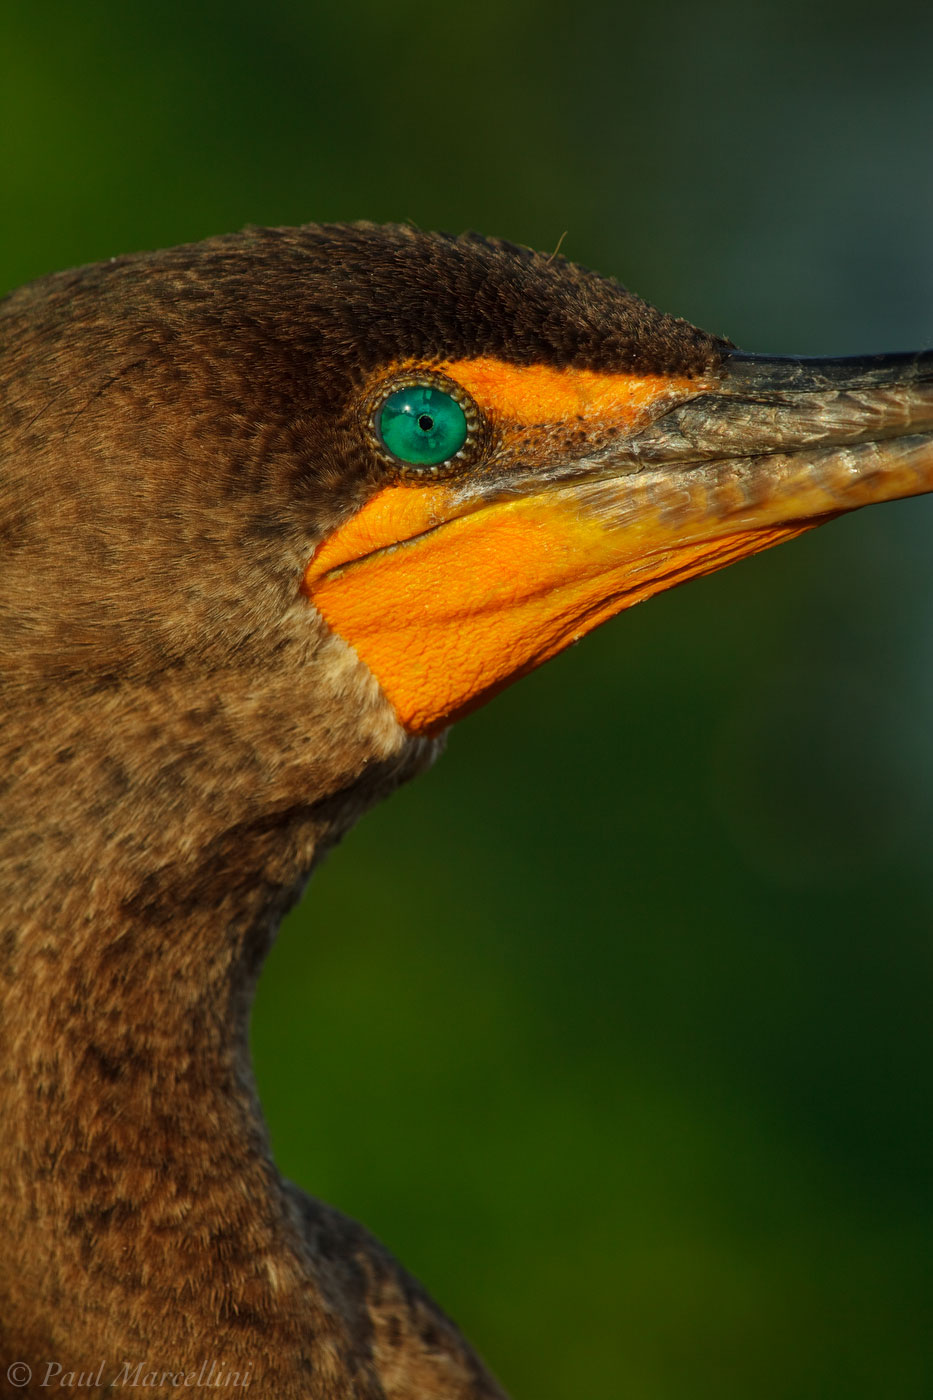 Double-crested Cormorant, Phalacrocorax auritus, everglades national park, florida, photo